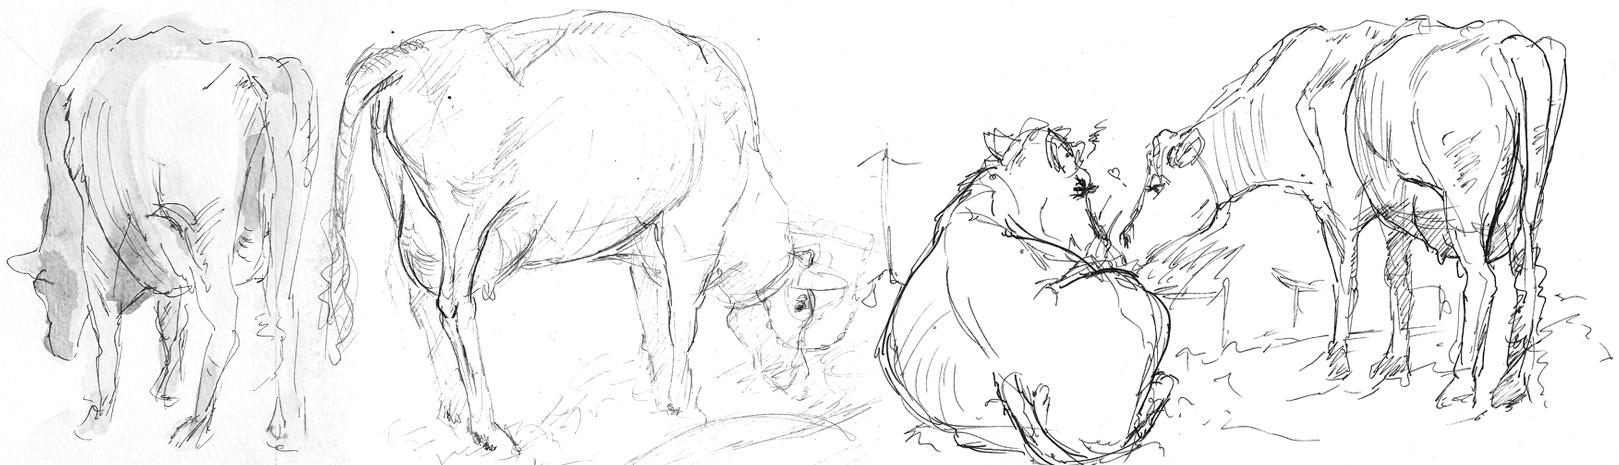 Animal studies, 2010